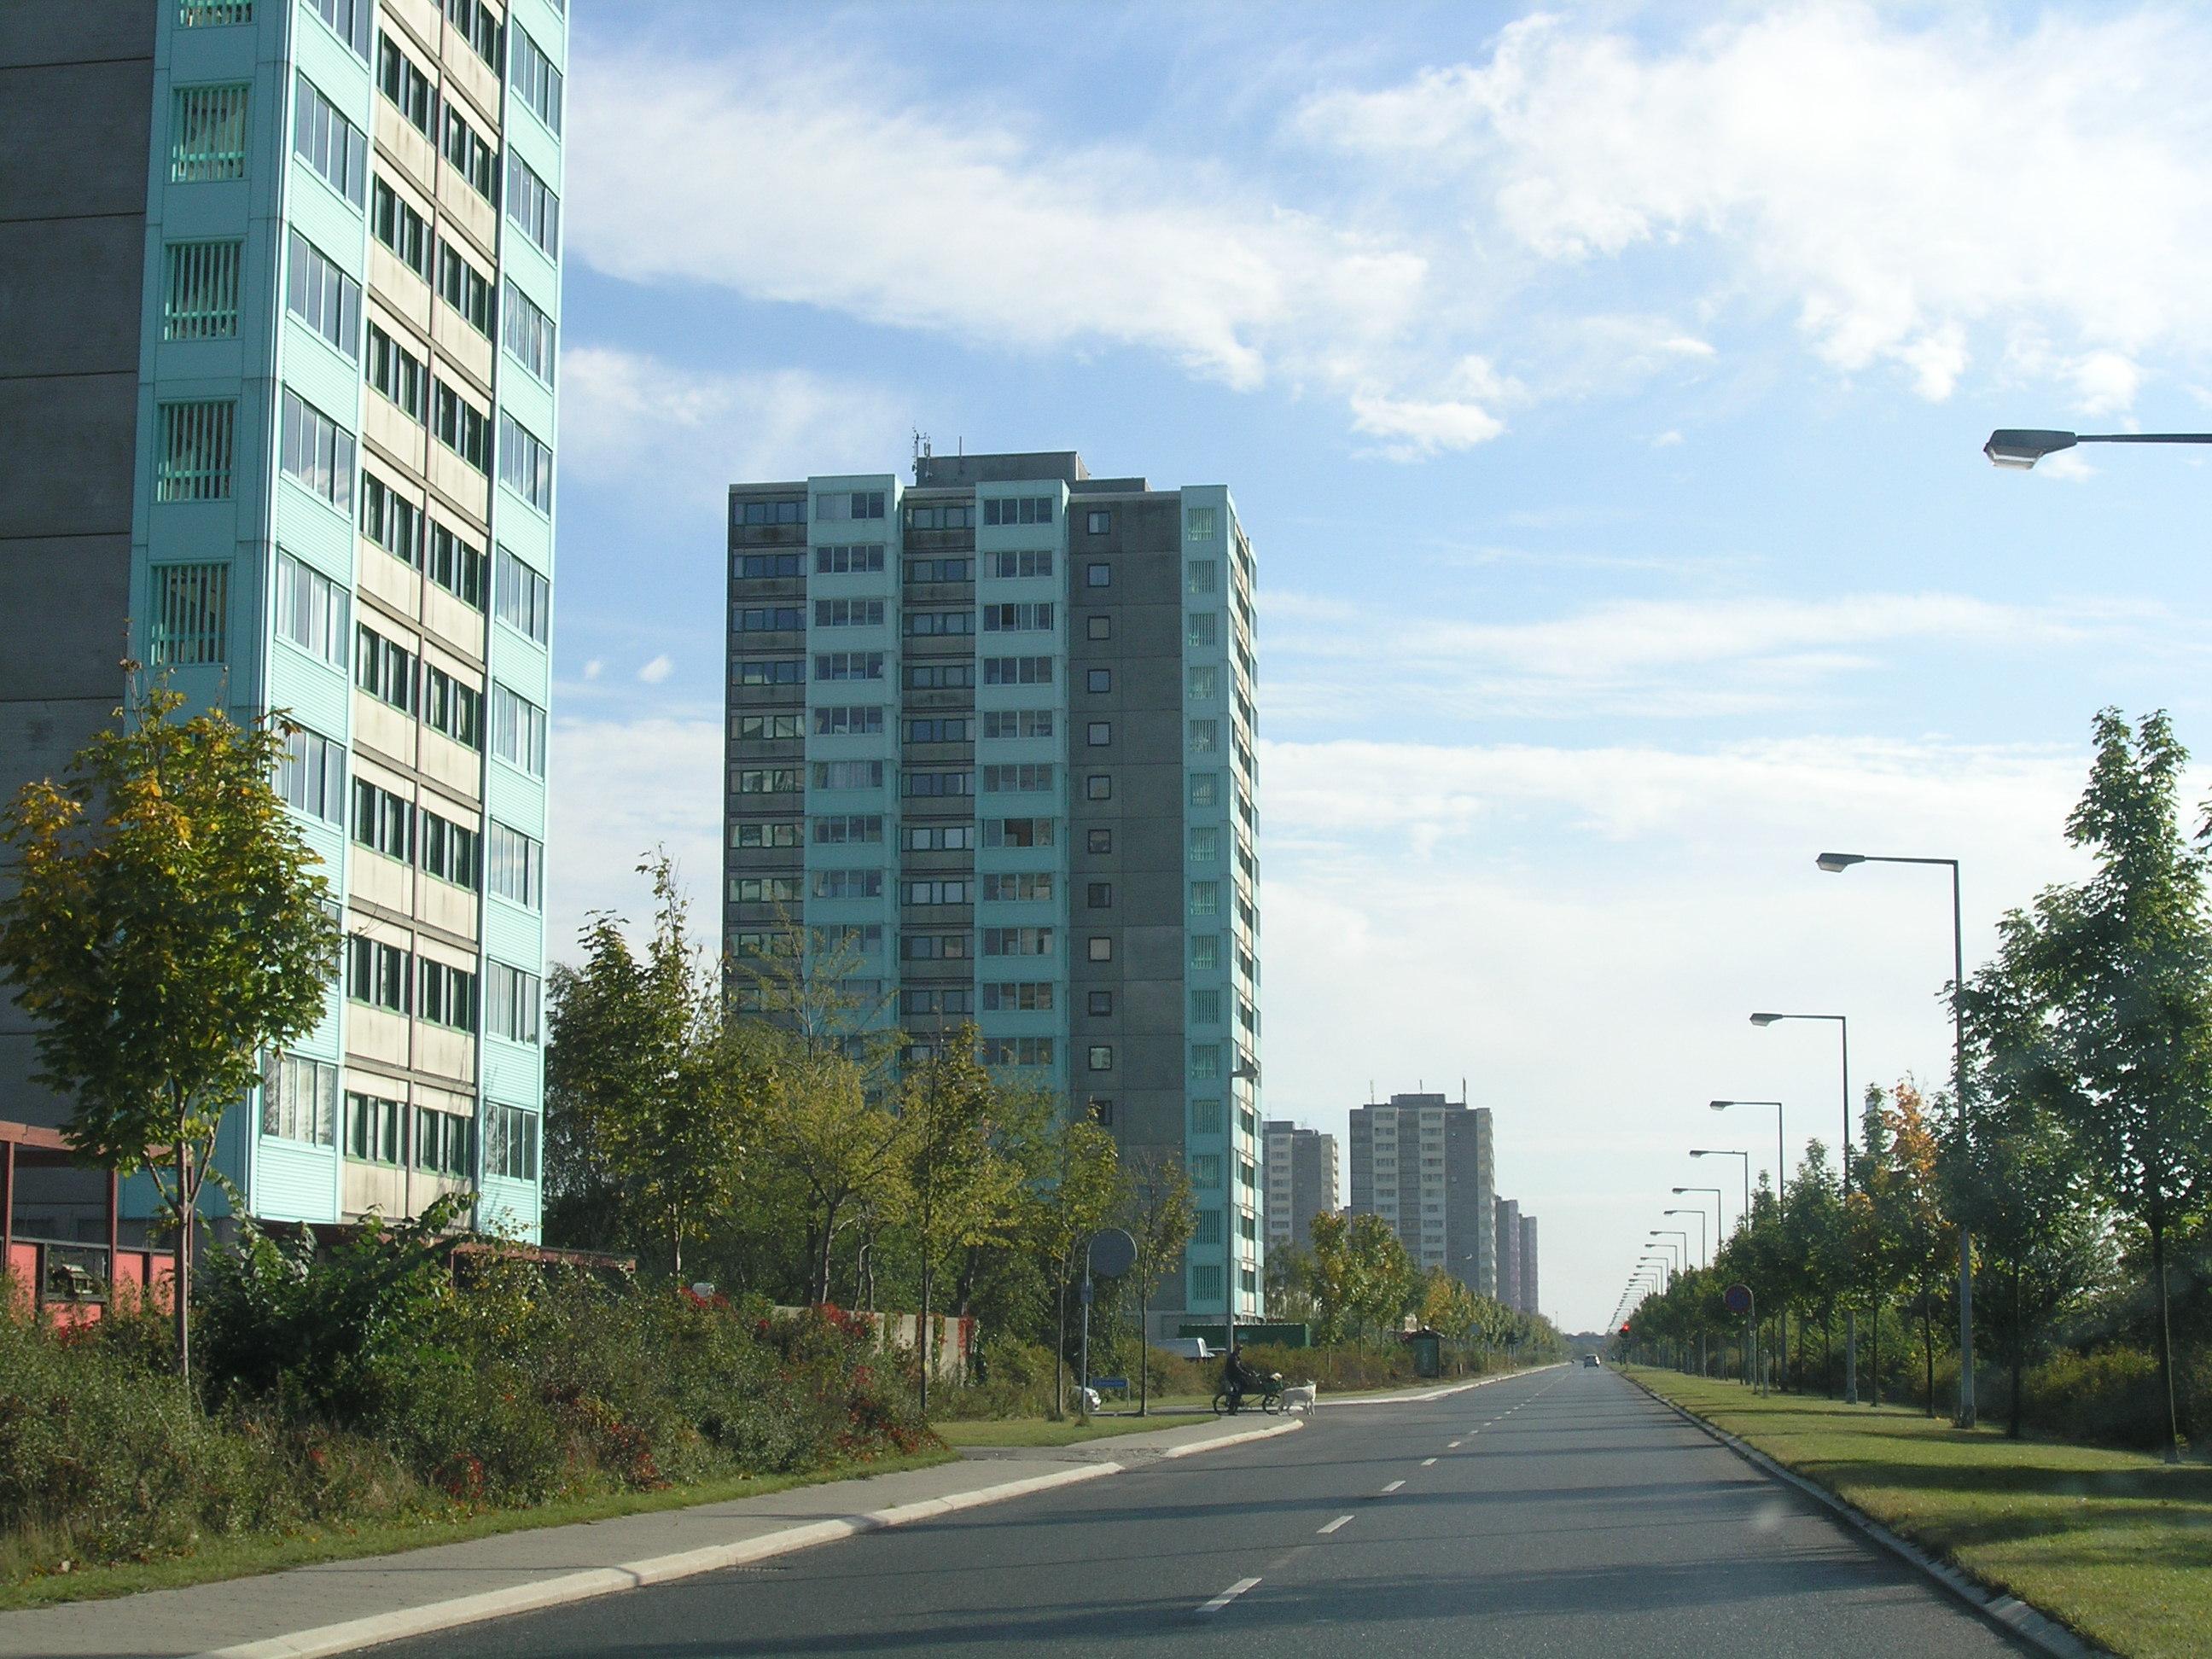 File:Brøndby Strand, October 2005.jpg - Wikimedia Commons